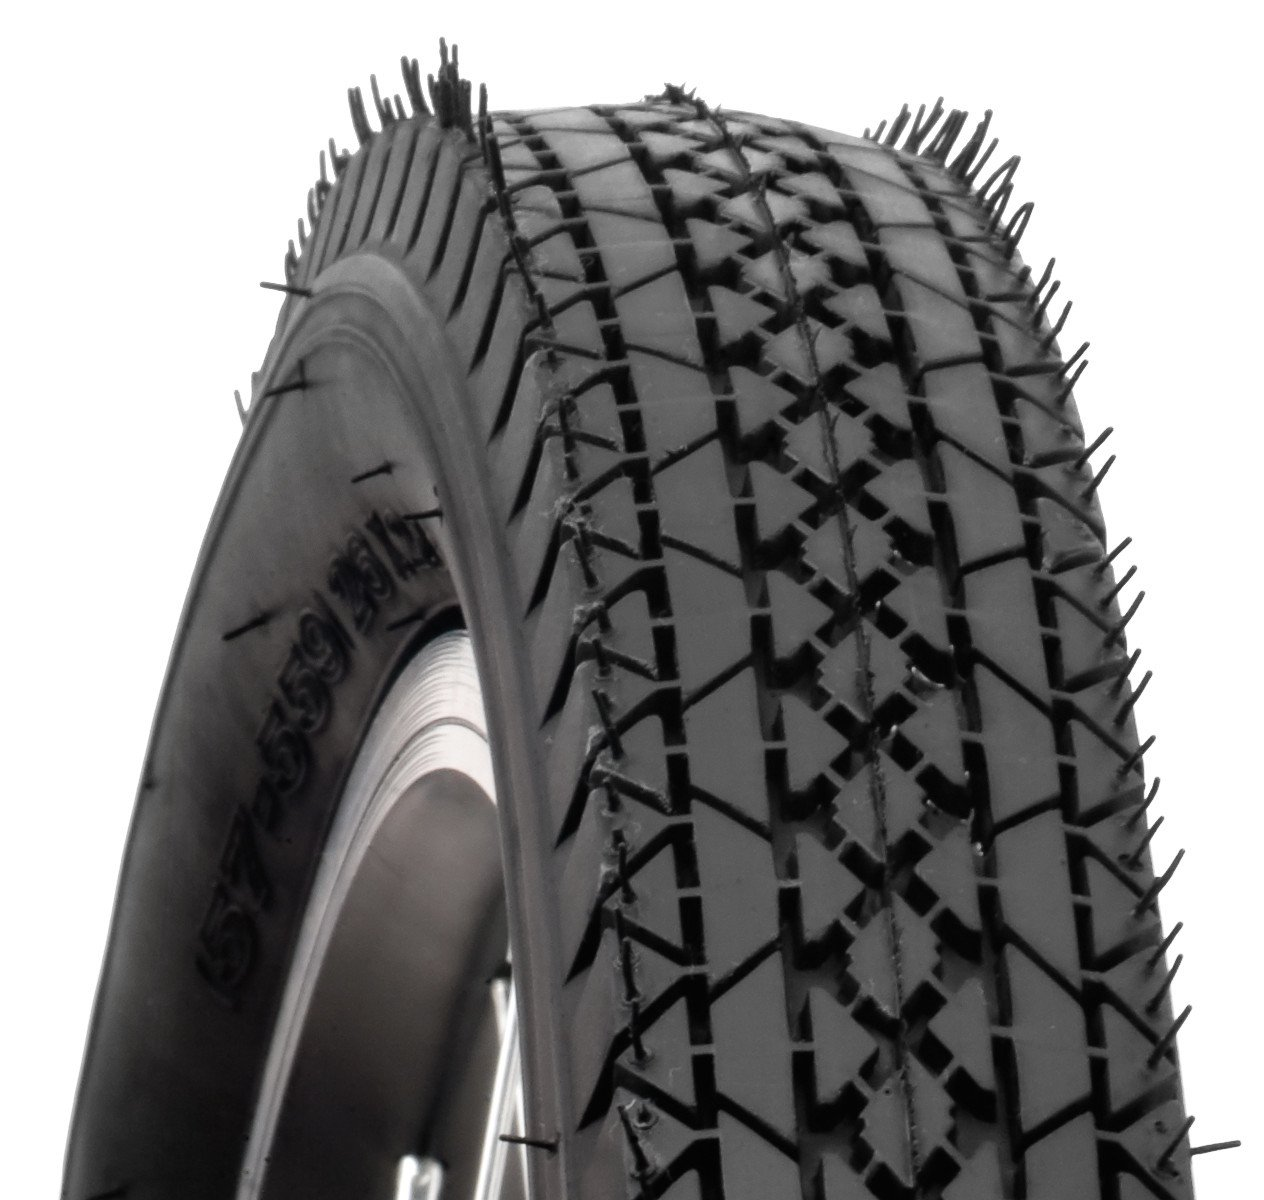 Schwinn Cruiser Bike Tire with Kevlar (Black, 26 x 2.12-Inch) by Schwinn (Image #1)